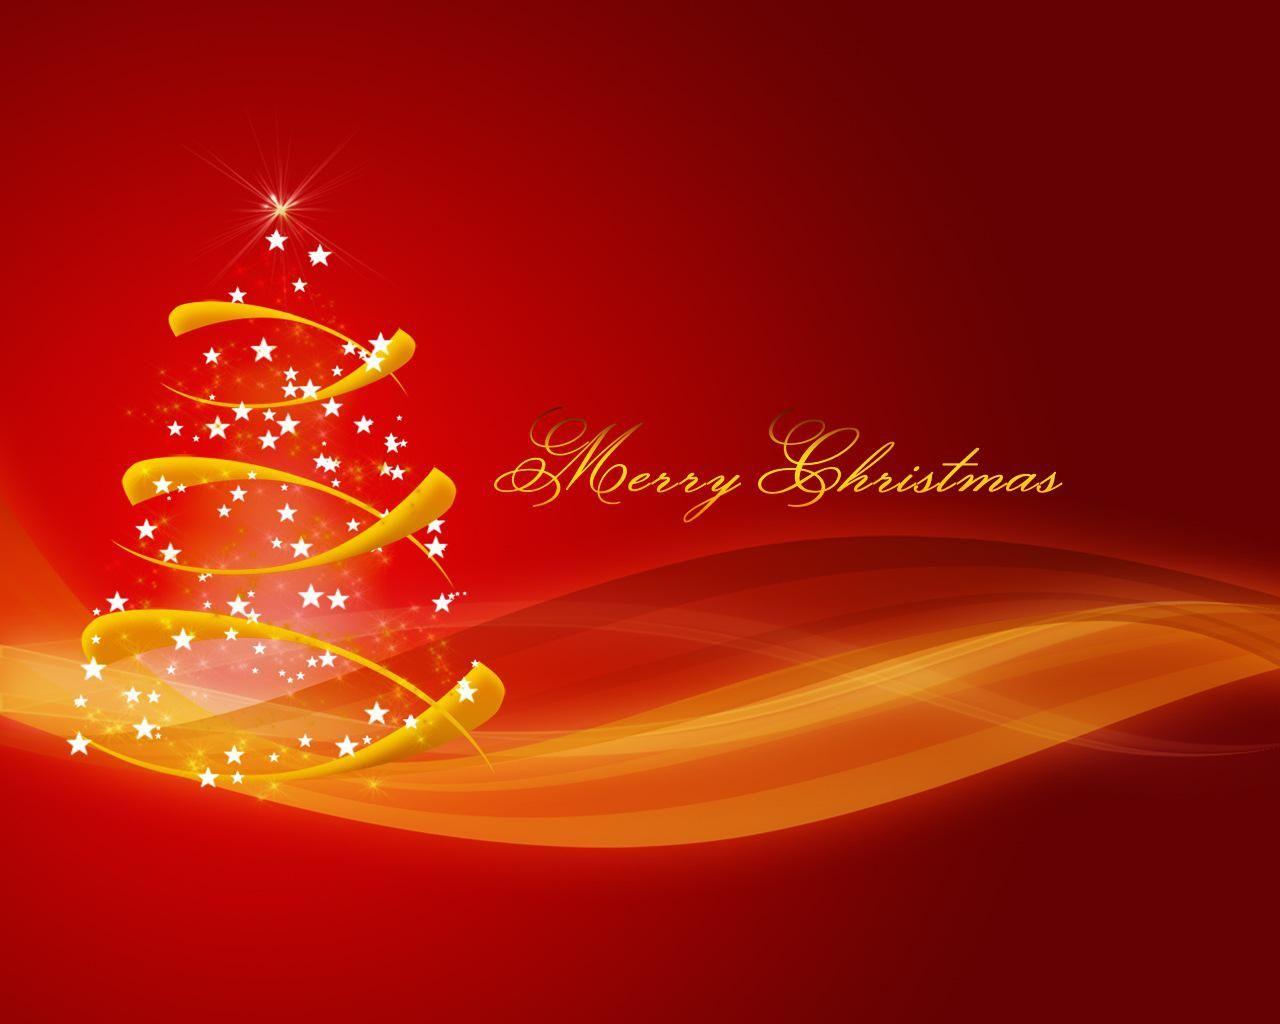 Leuke Nieuwjaarswensen 2016 Gelukkig Nieuwjaar Christmas Desktop Merry Christmas Wallpaper Free Christmas Backgrounds